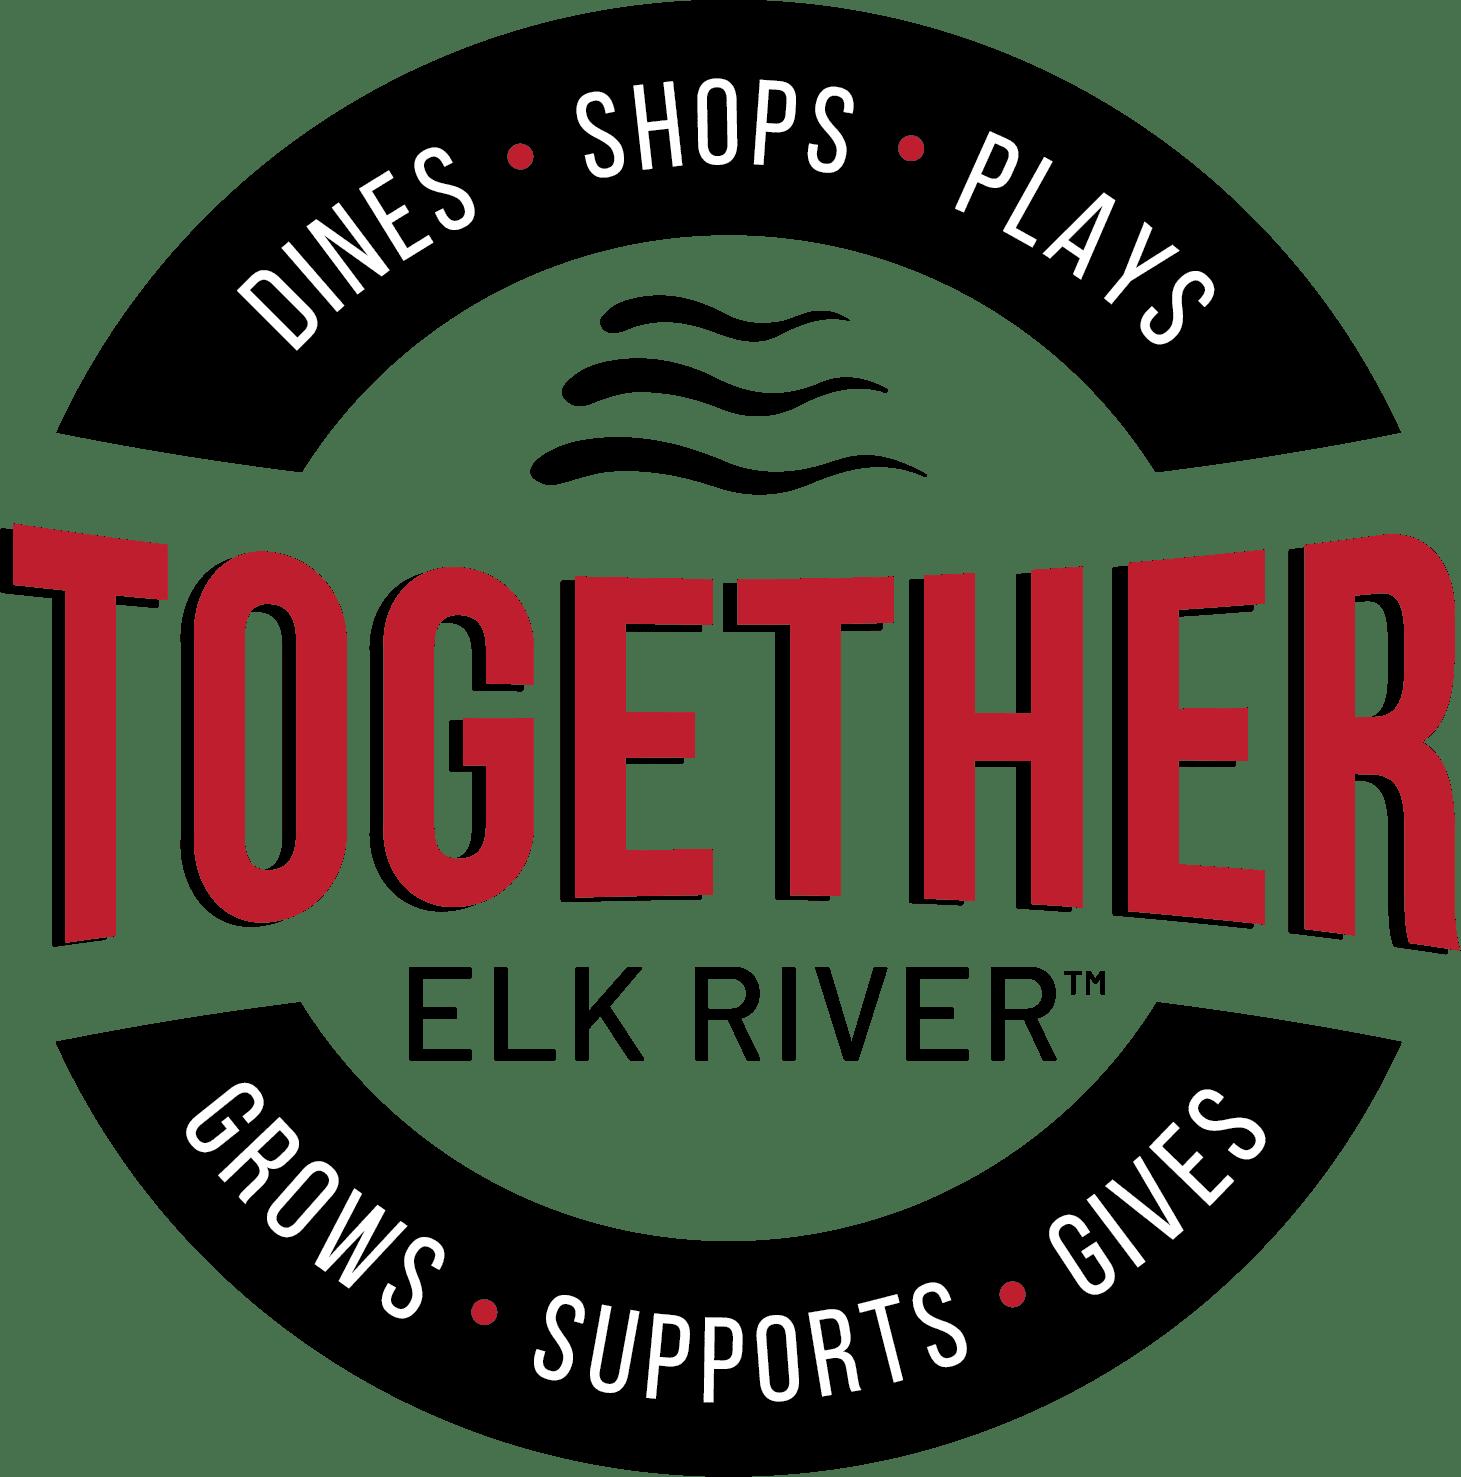 Together Elk River: When Elk River Supports Elk River, The Community Wins Main Photo